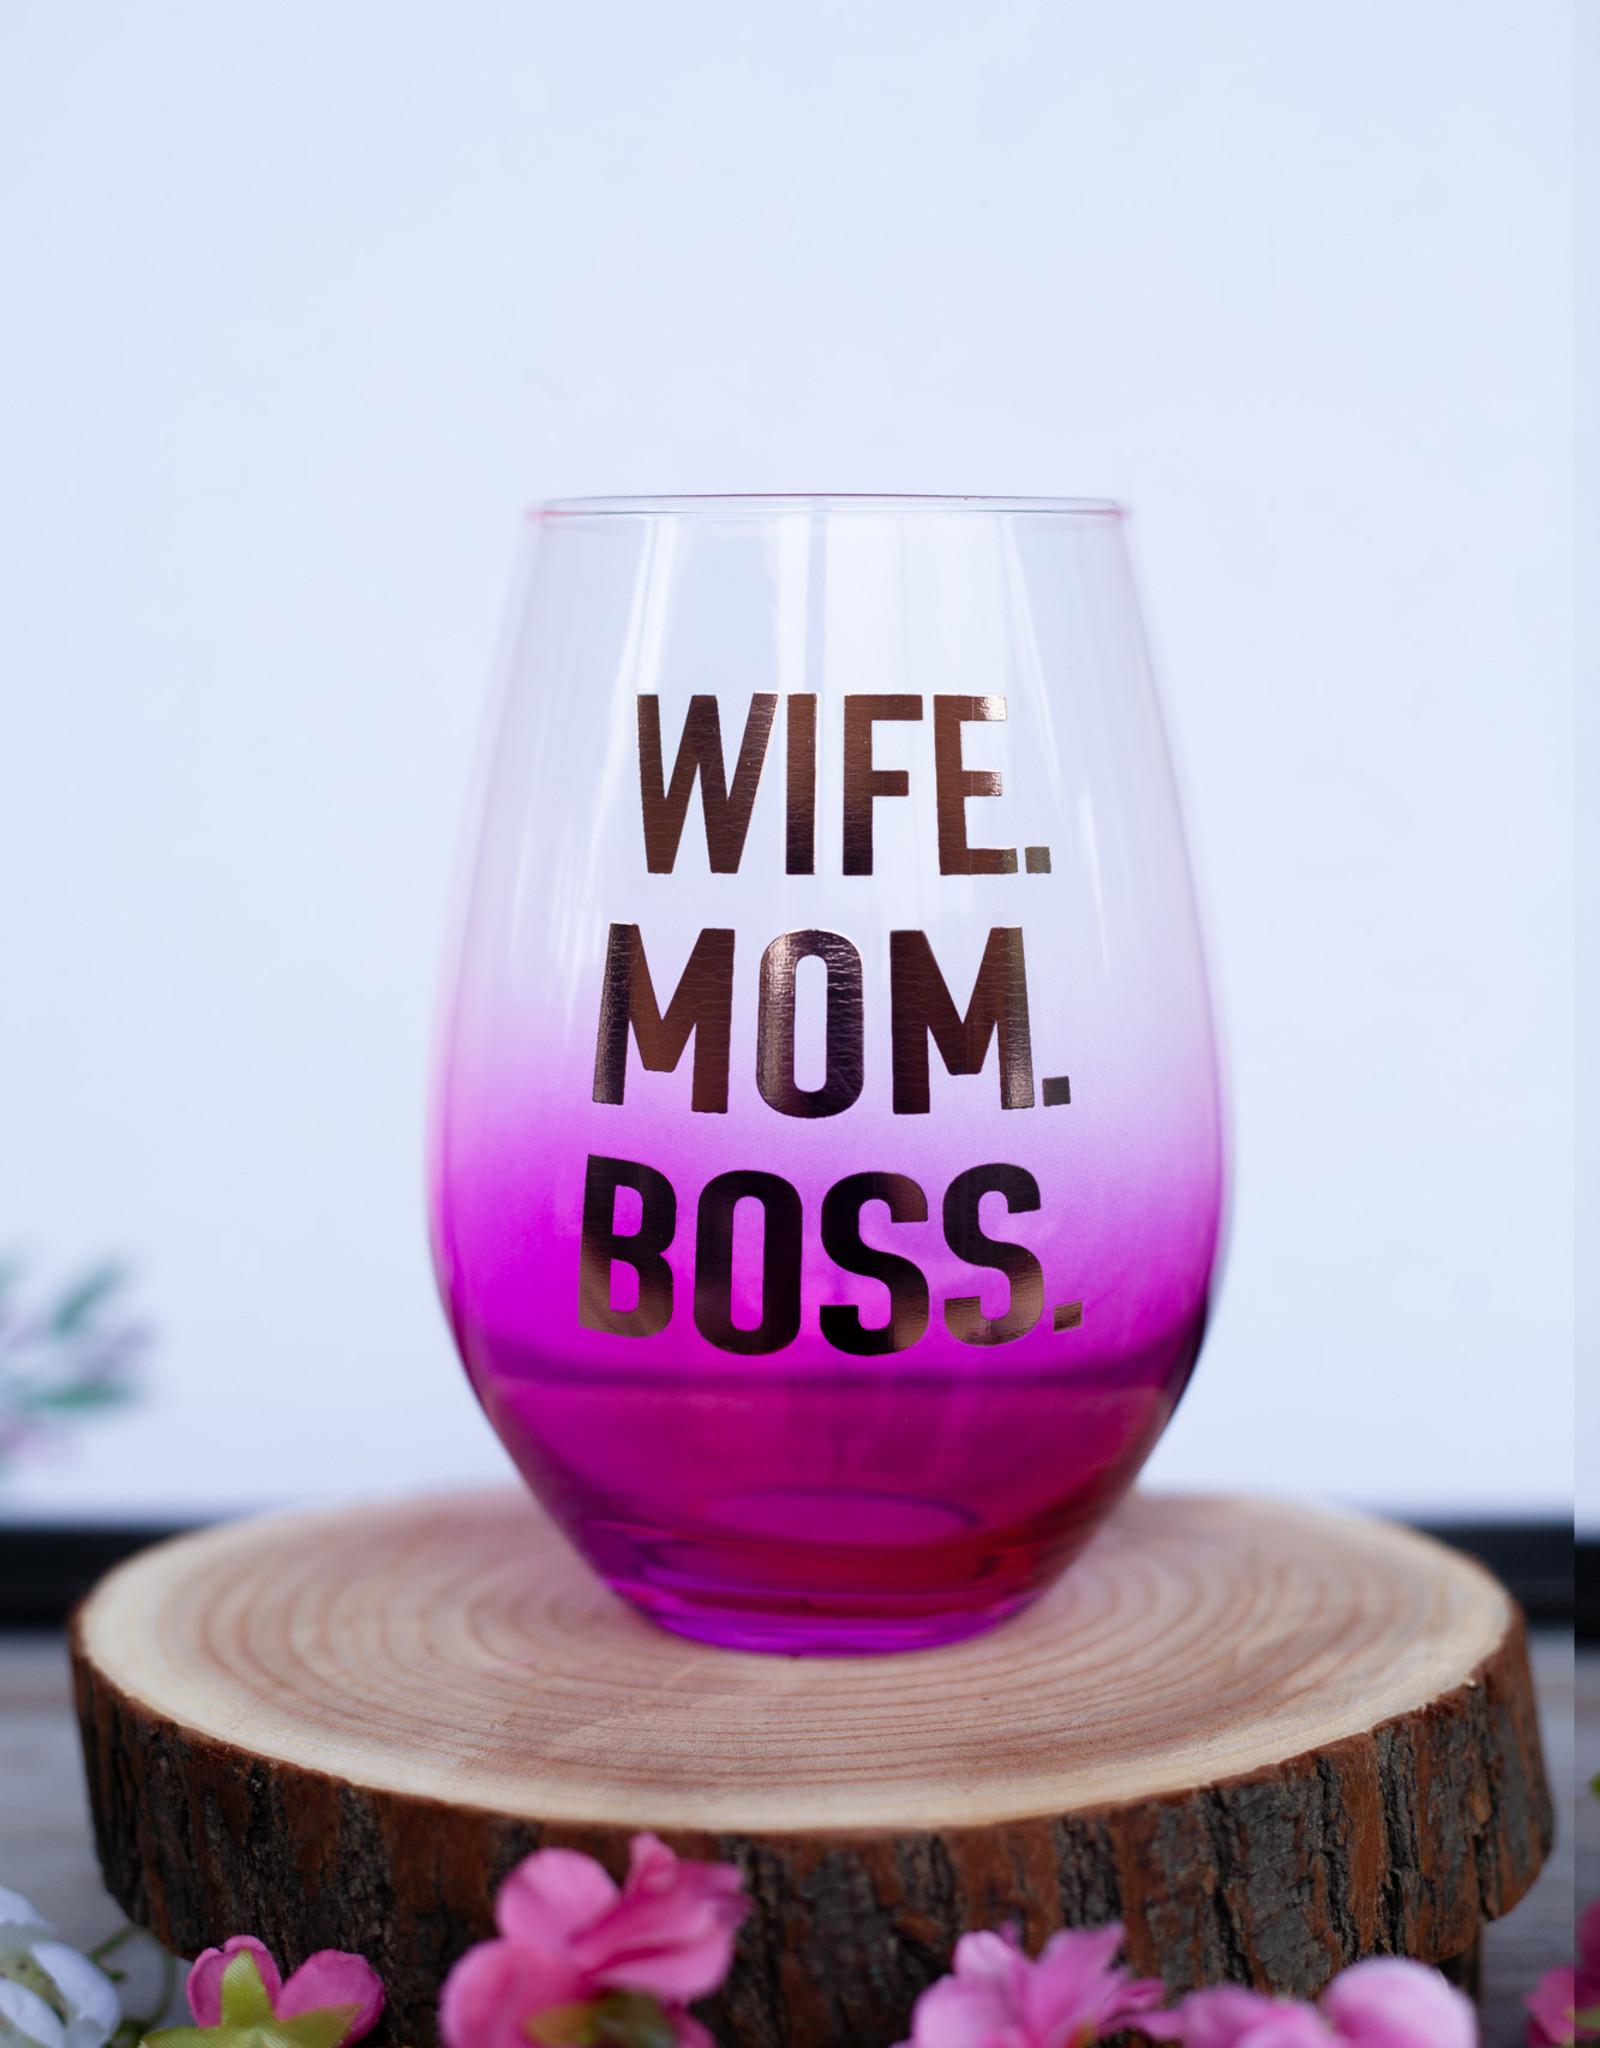 Wife. Mom. Boss. 30oz Wine